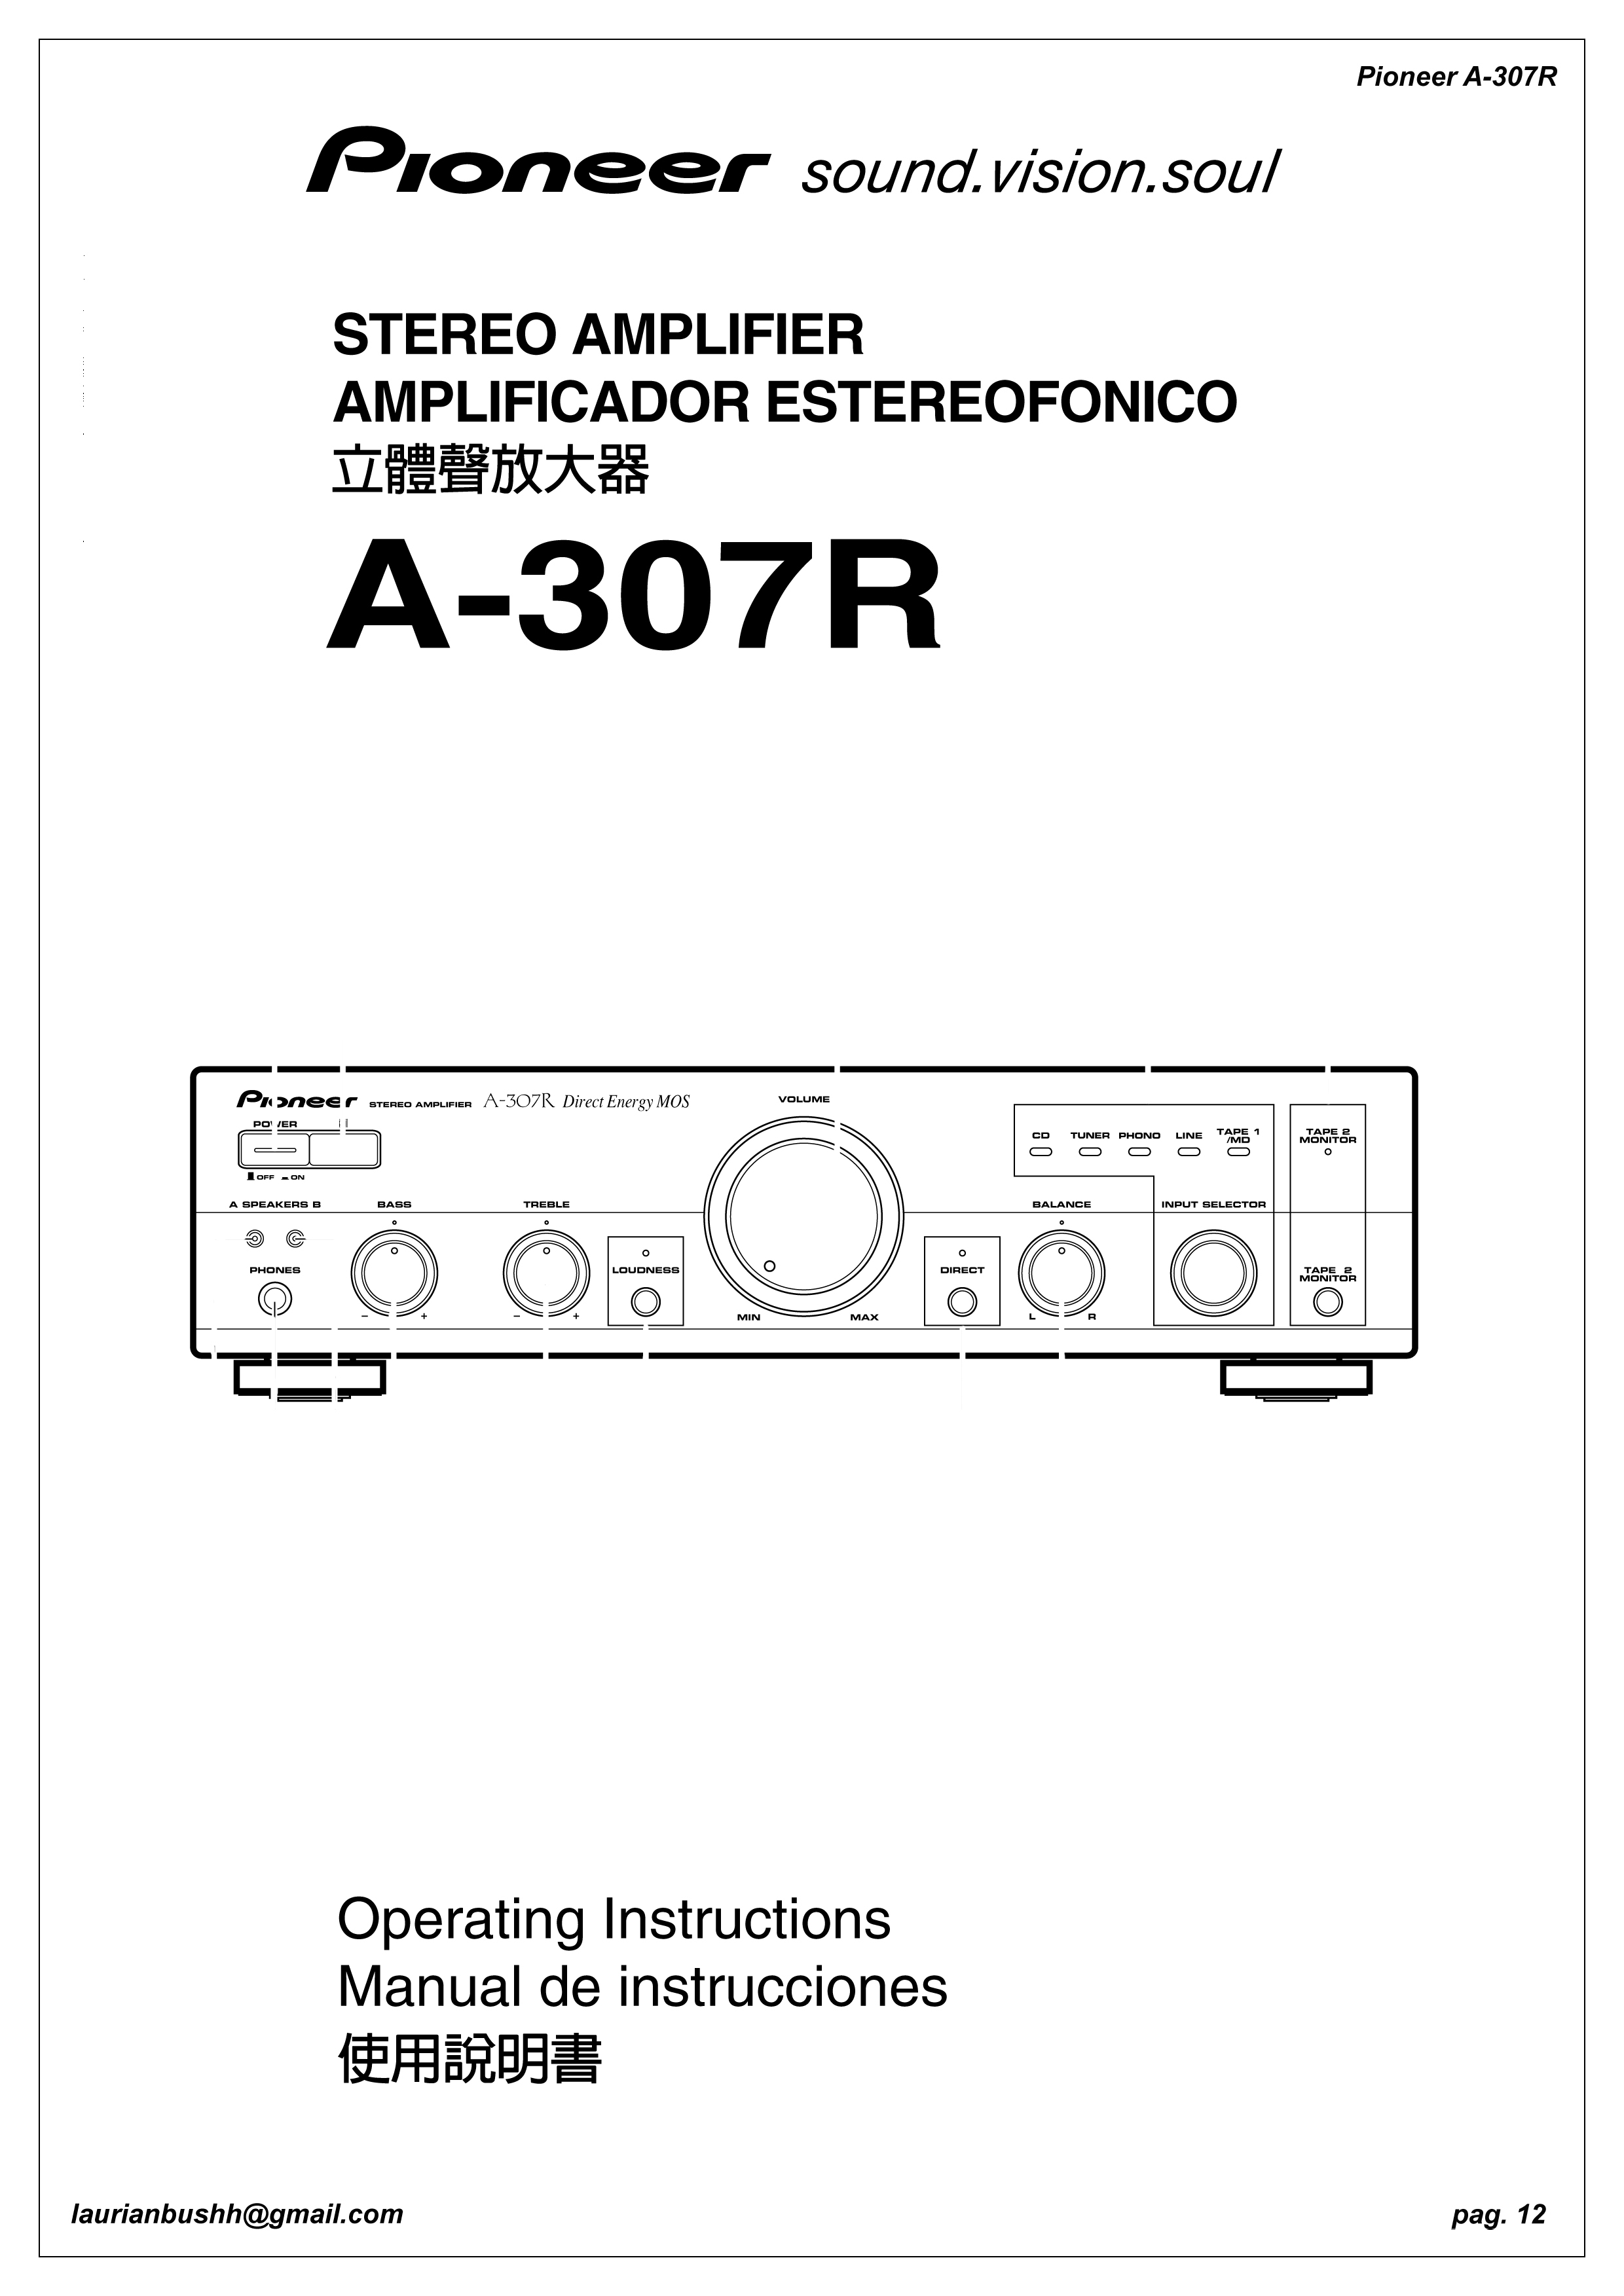 manuale tehnice pioneer documentatii tehnice manuale de utilizare rh manualetehnicepioneer wordpress com Atari Climber Manual Atari Climber Manual